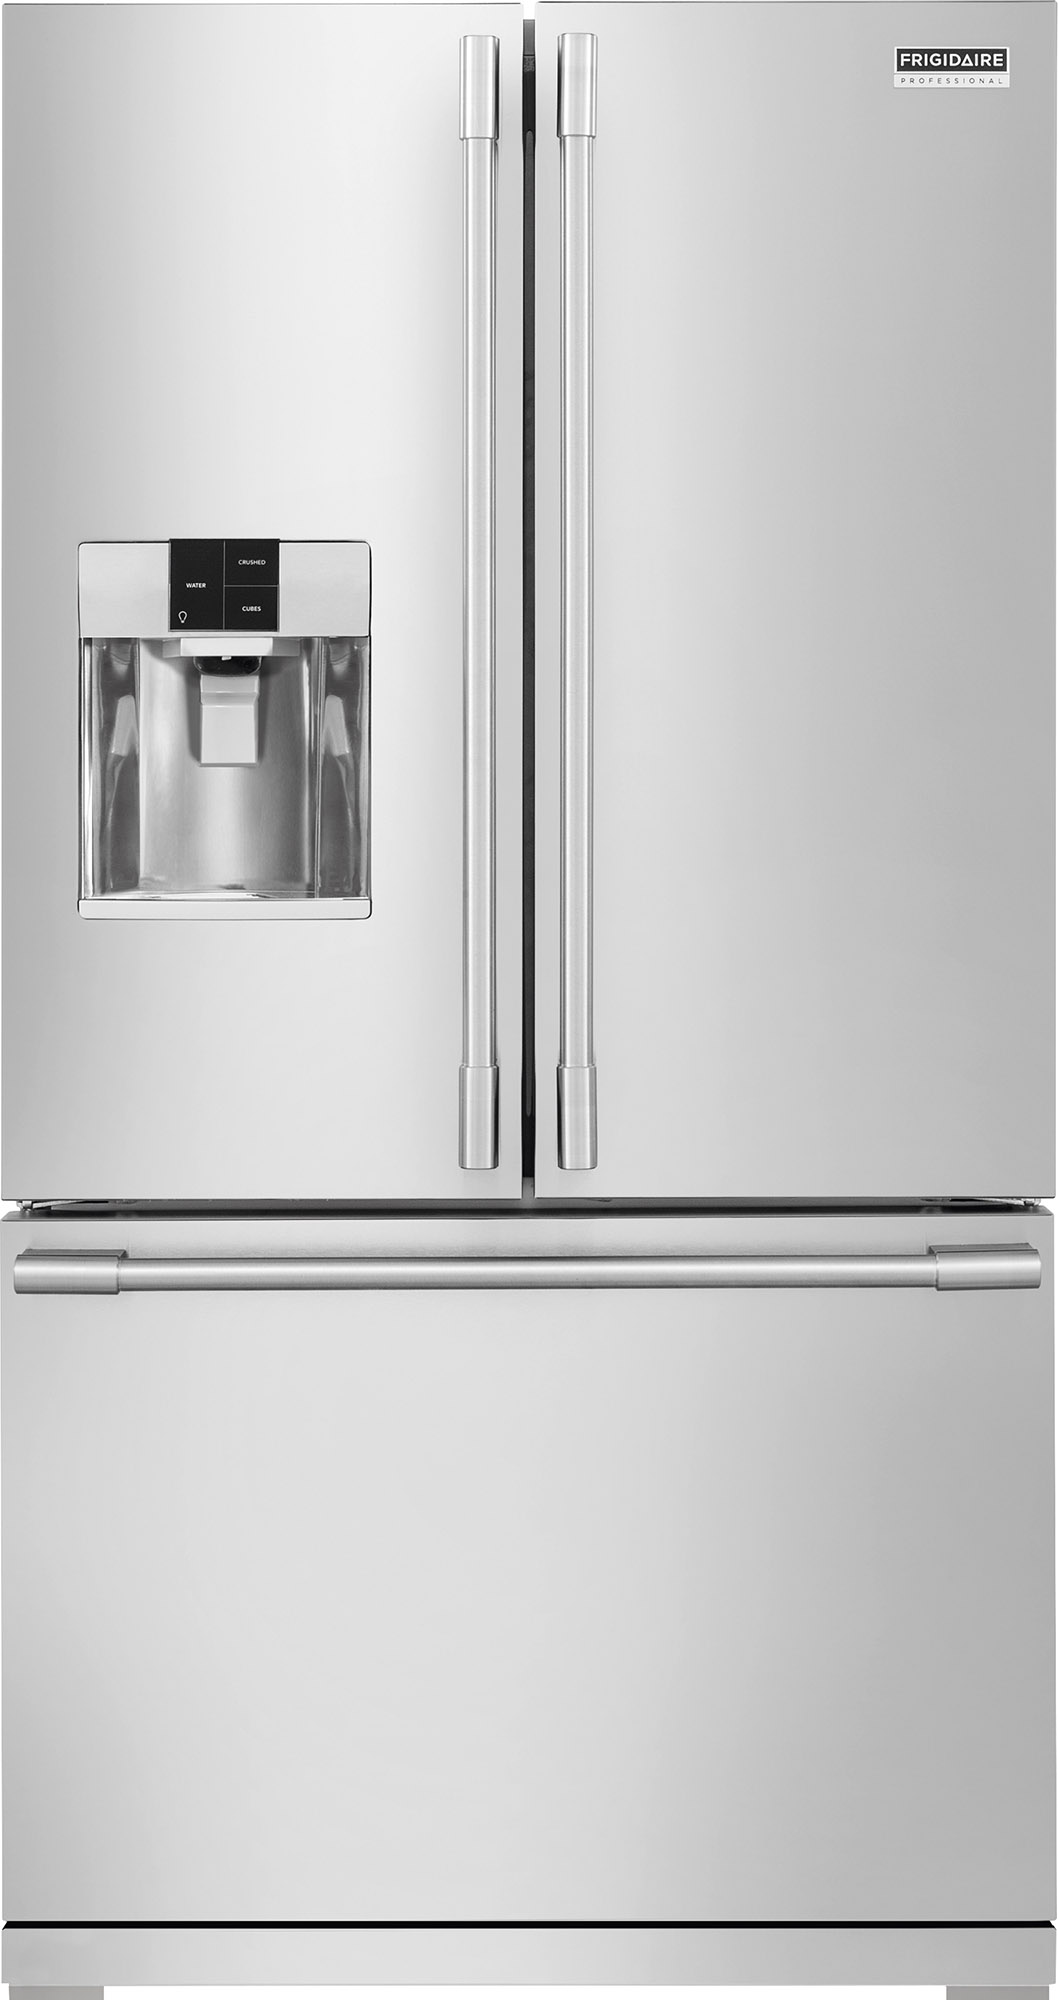 Frigidaire Refrigerator Replace Main Control Board #5304502750